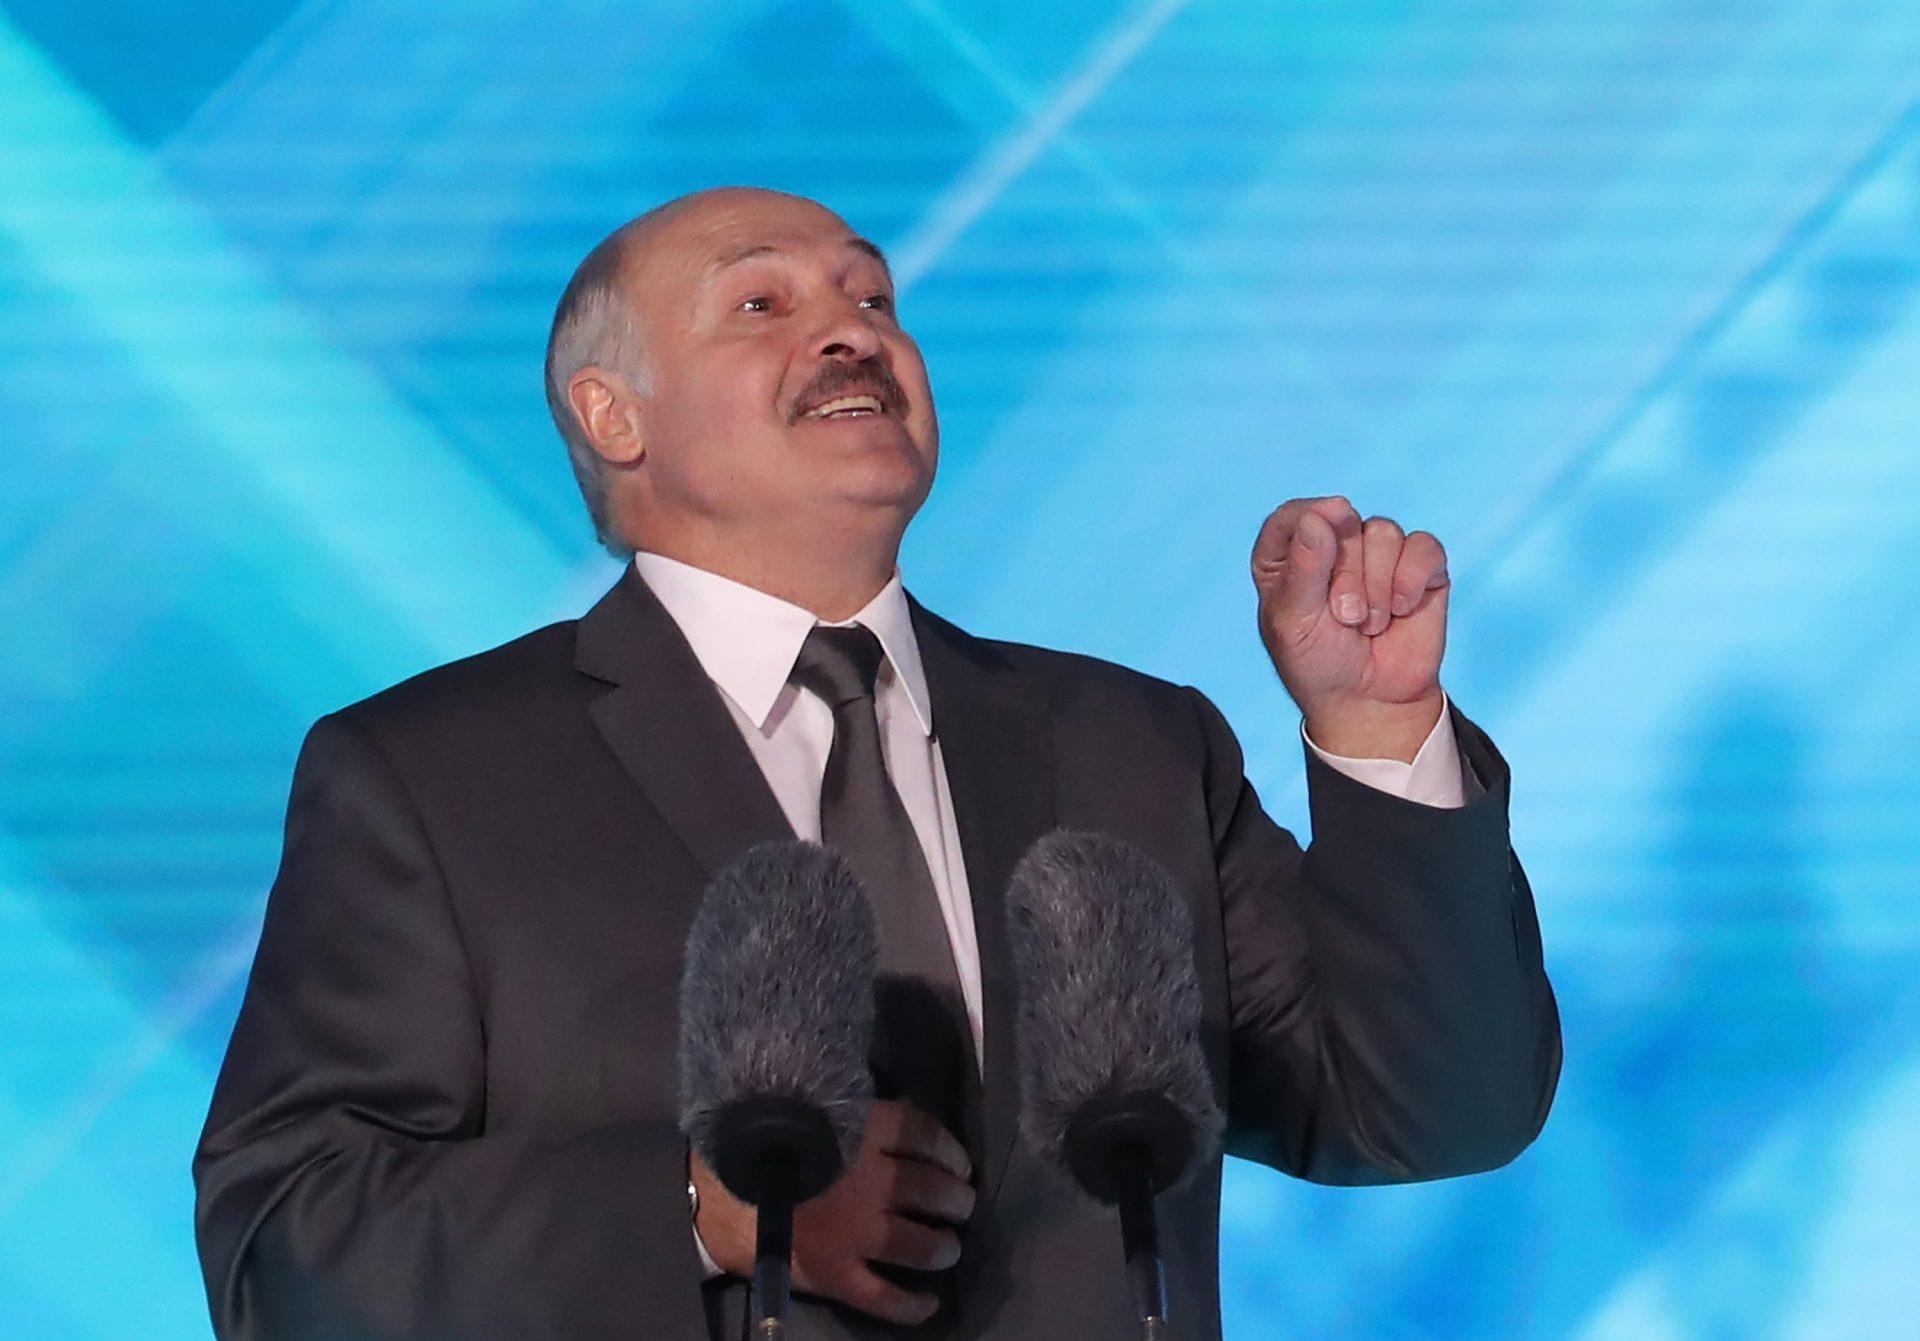 Belarus' president Alexander Lukashenko – or should that be Lukashenka? Credit: Natalia Fedosenko/TASS/Getty